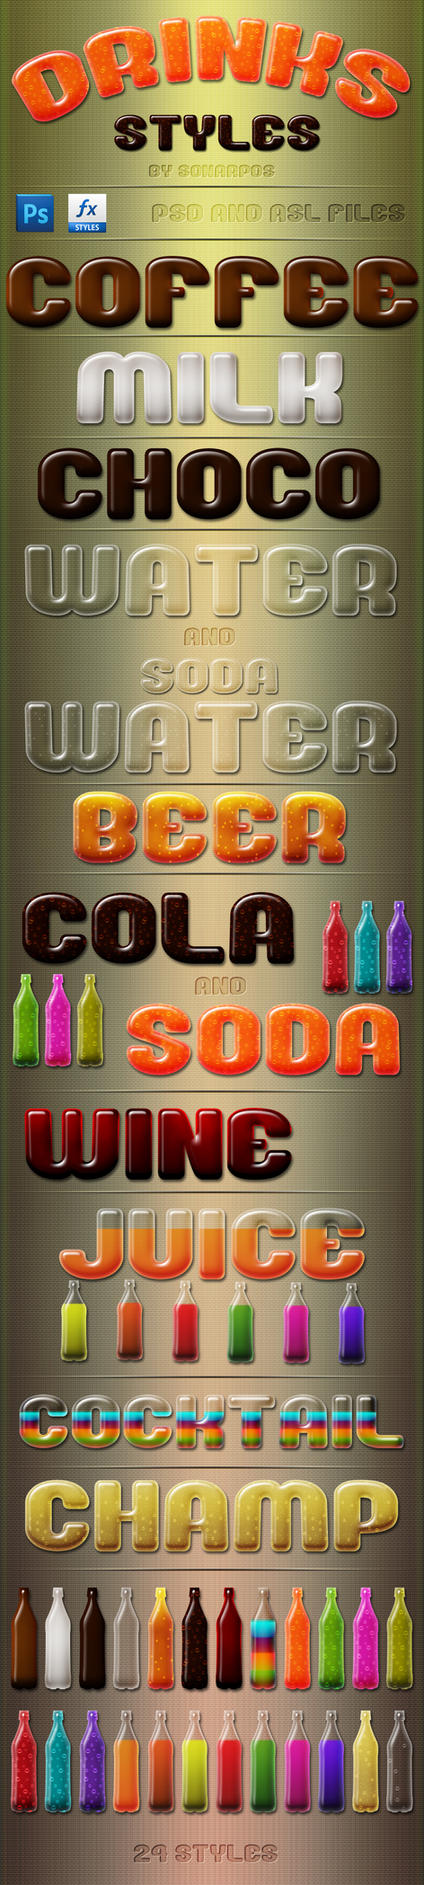 drinks styles by sonarpos